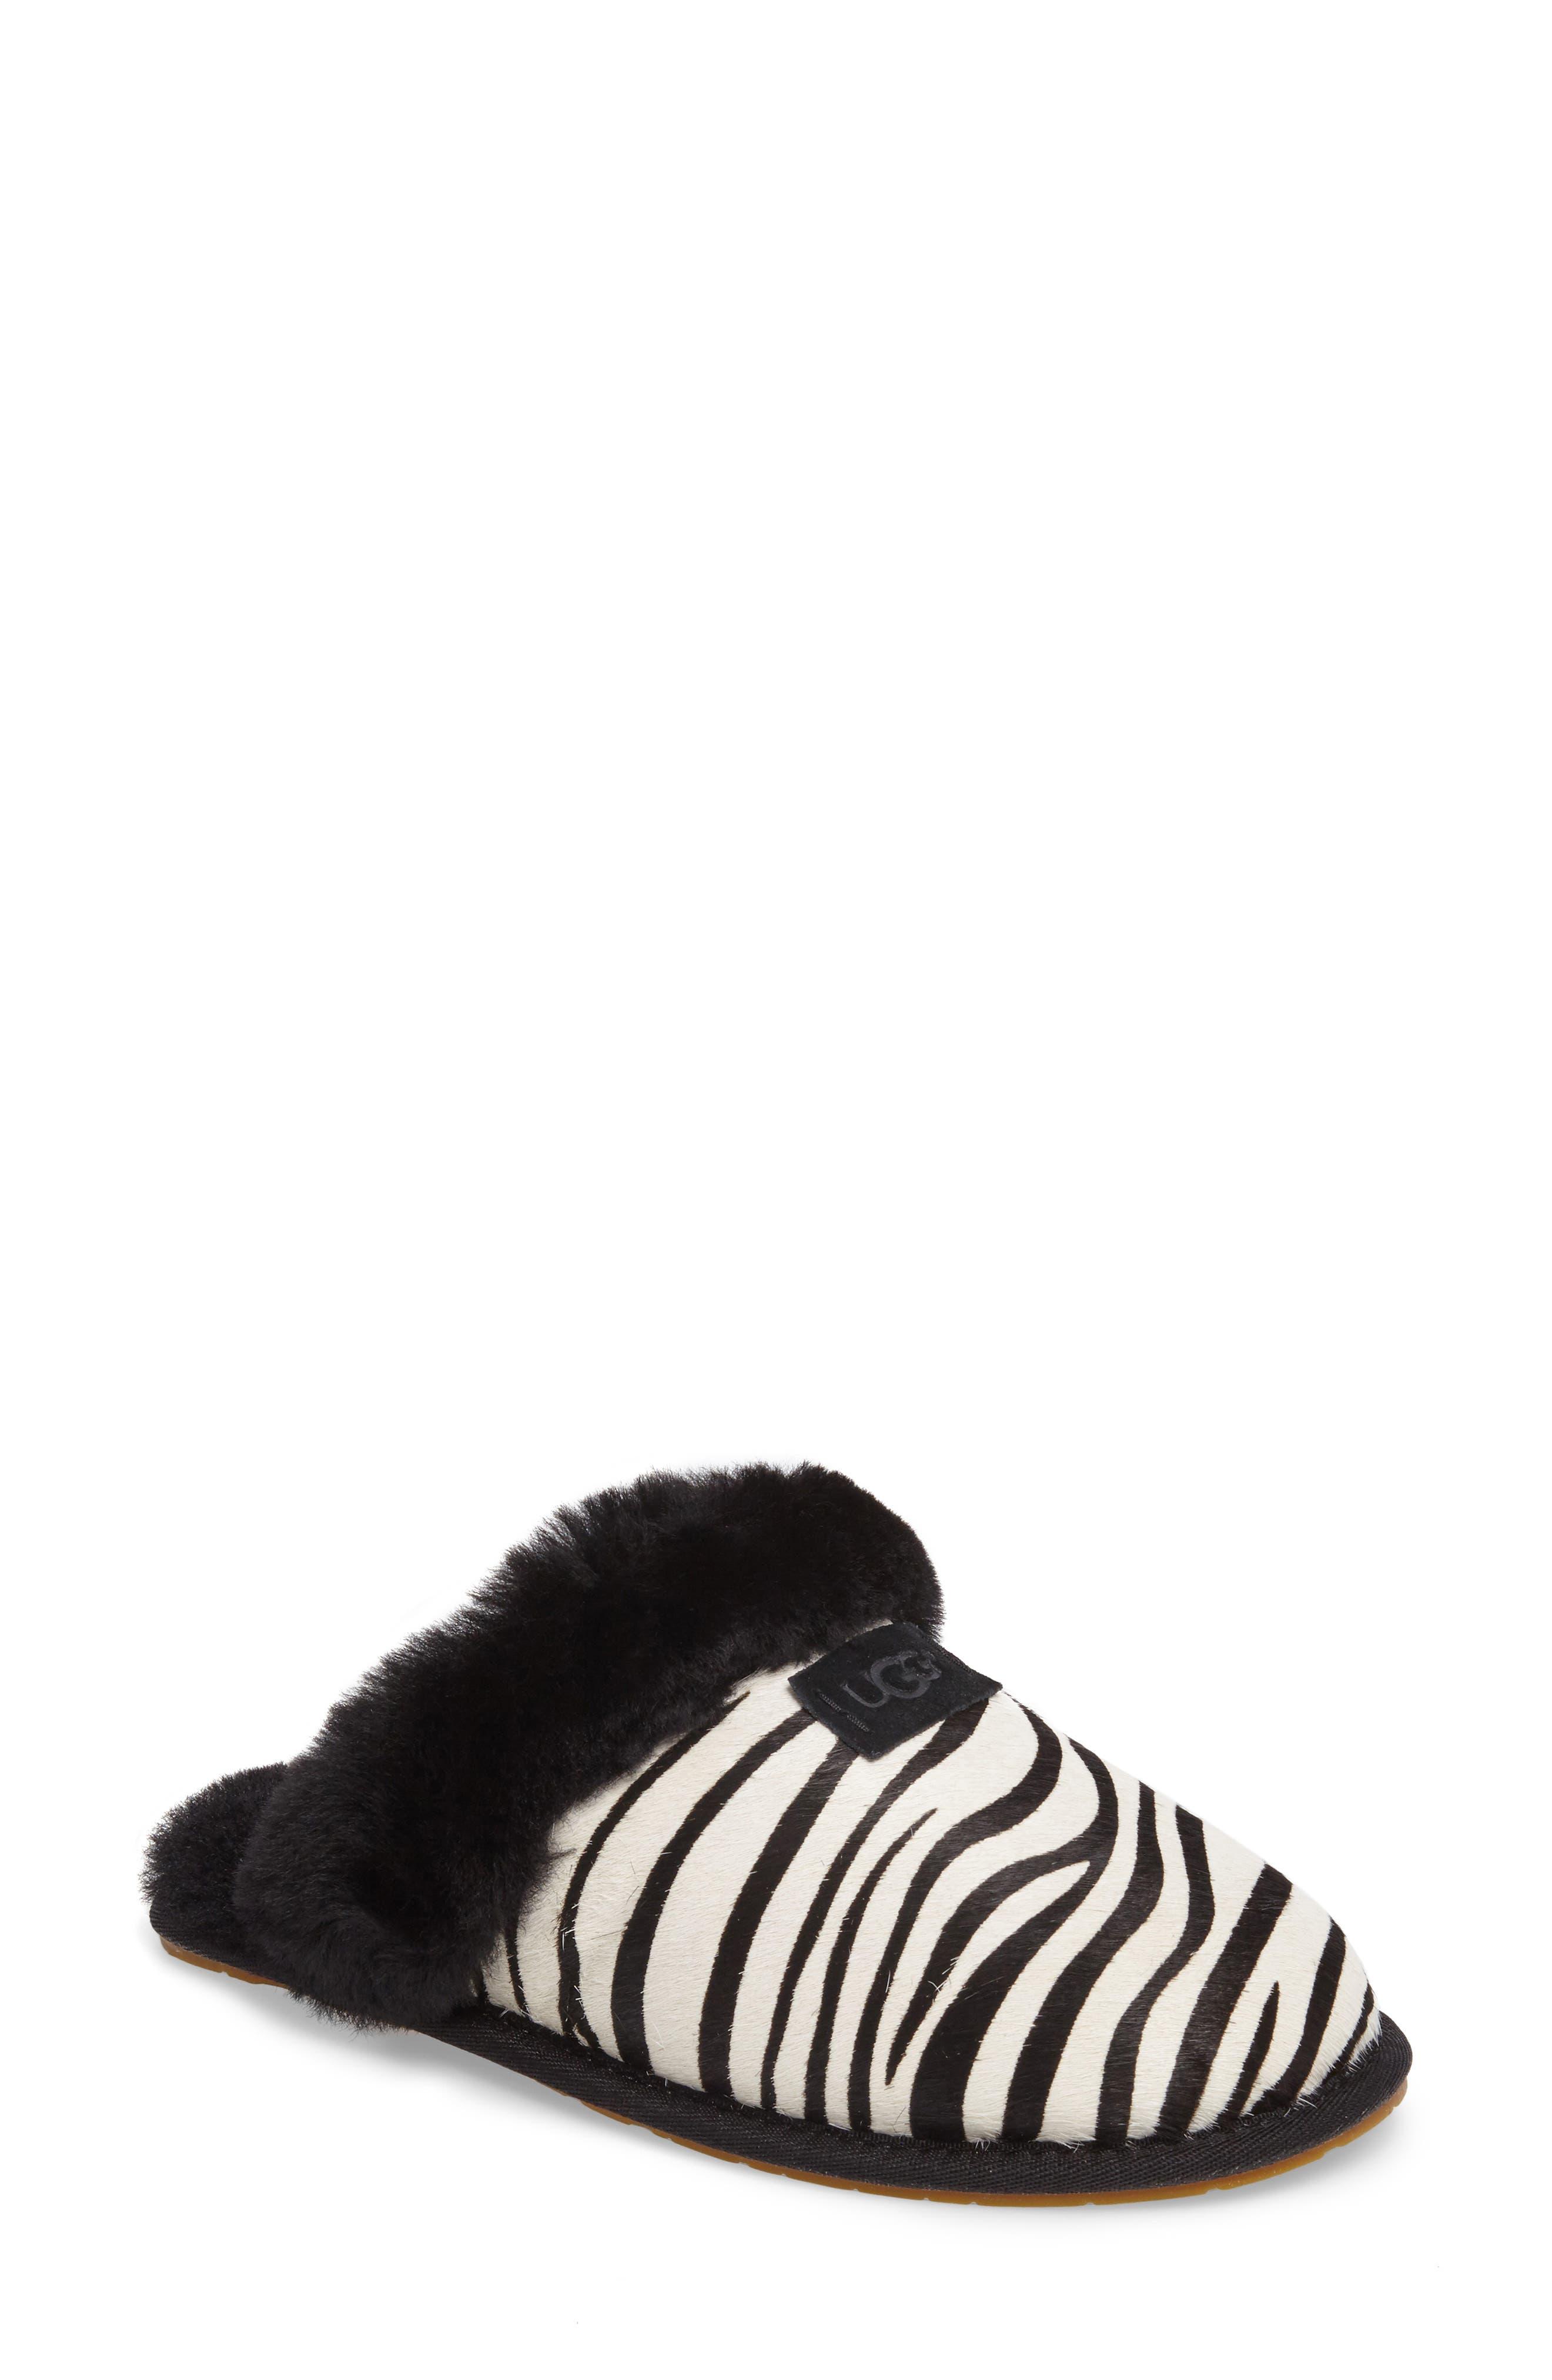 Alternate Image 1 Selected - UGG® Australia Scuffette II - Exotic Genuine Calf Hair Slipper (Women)